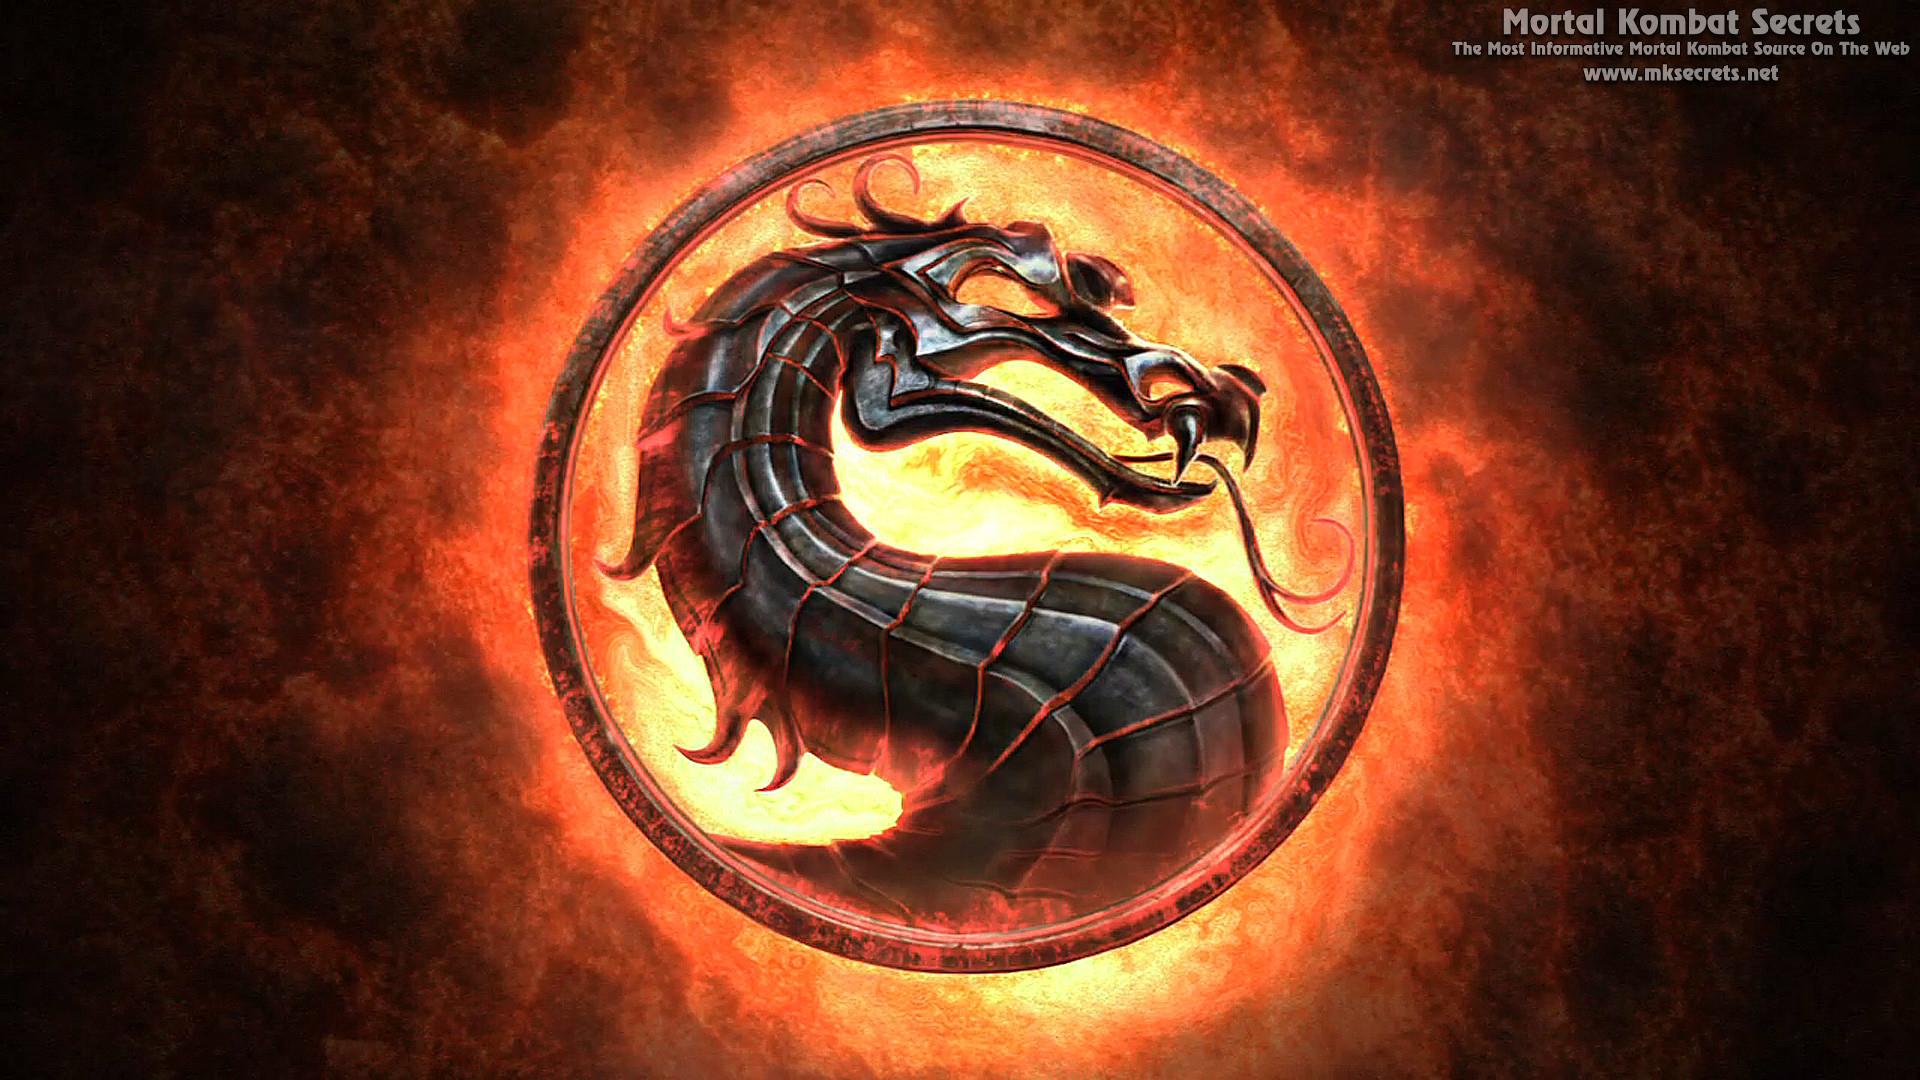 Mortal Kombat 9 Scorpion Wallpaper 72 Images